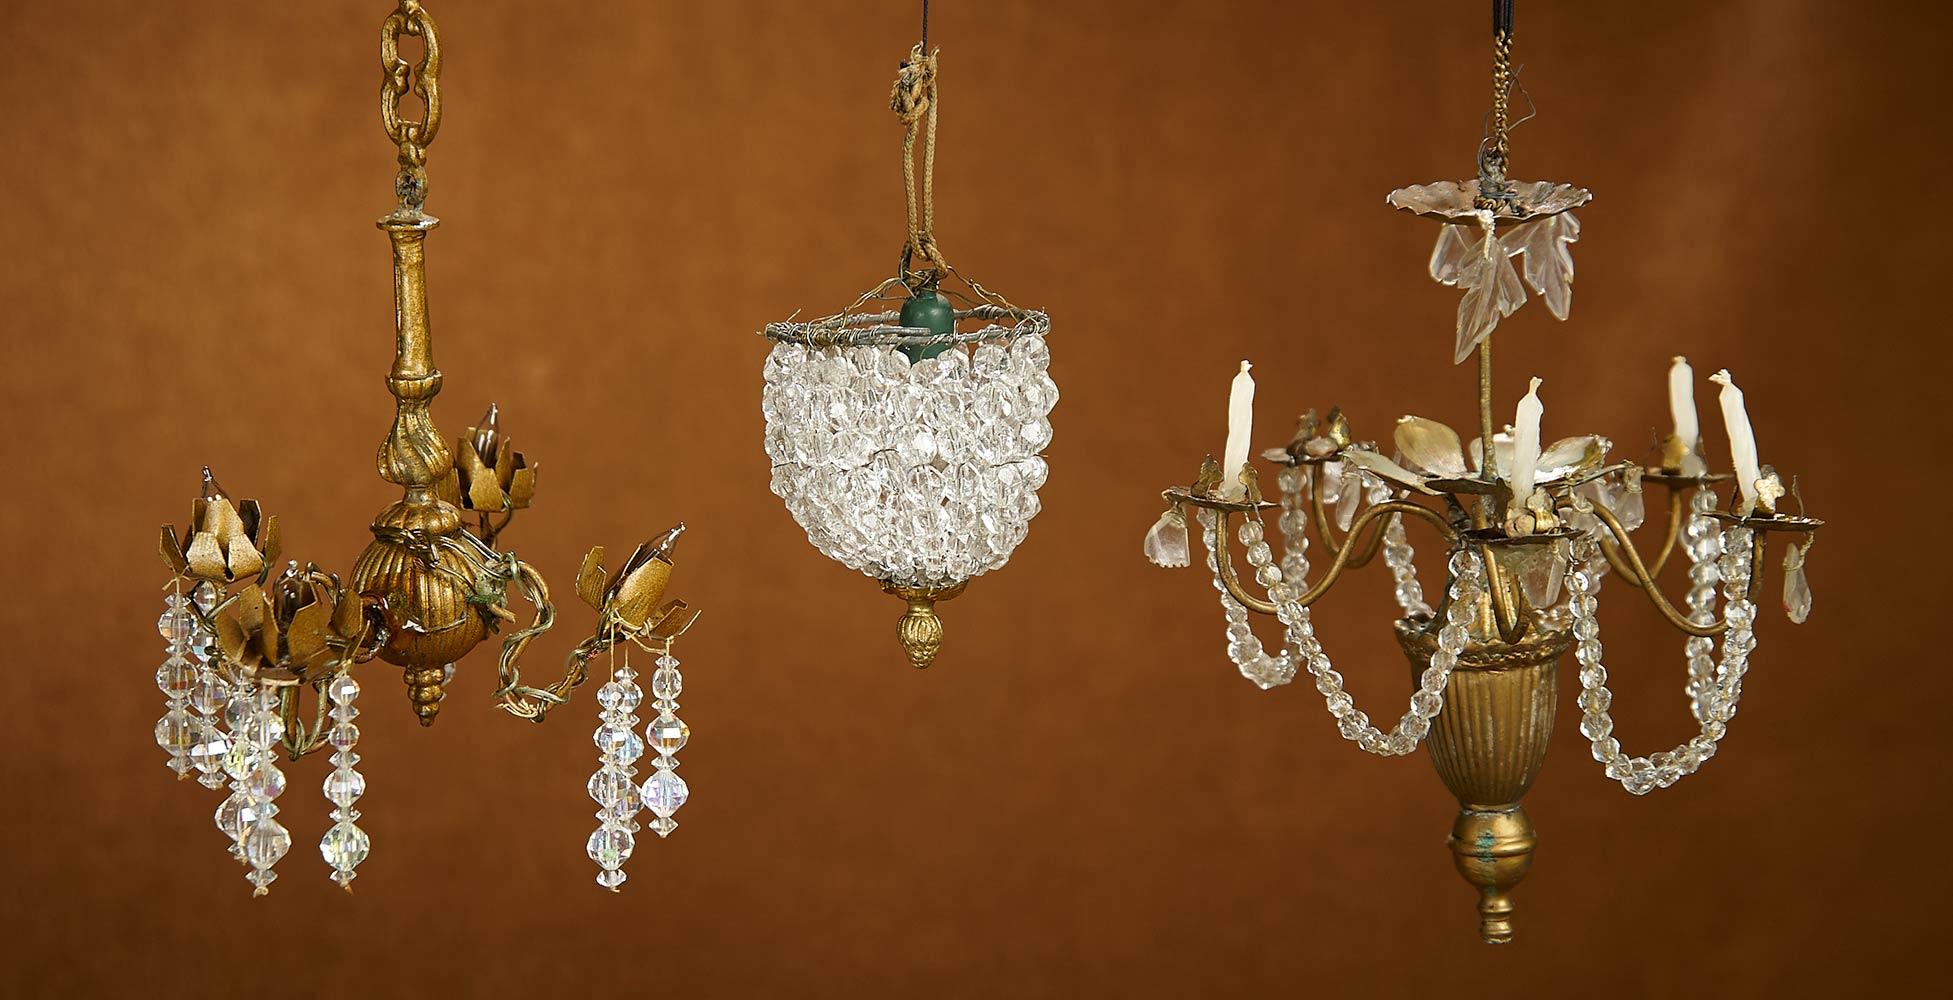 Three 19th Century Elegant Miniature Crystal Chandeliers